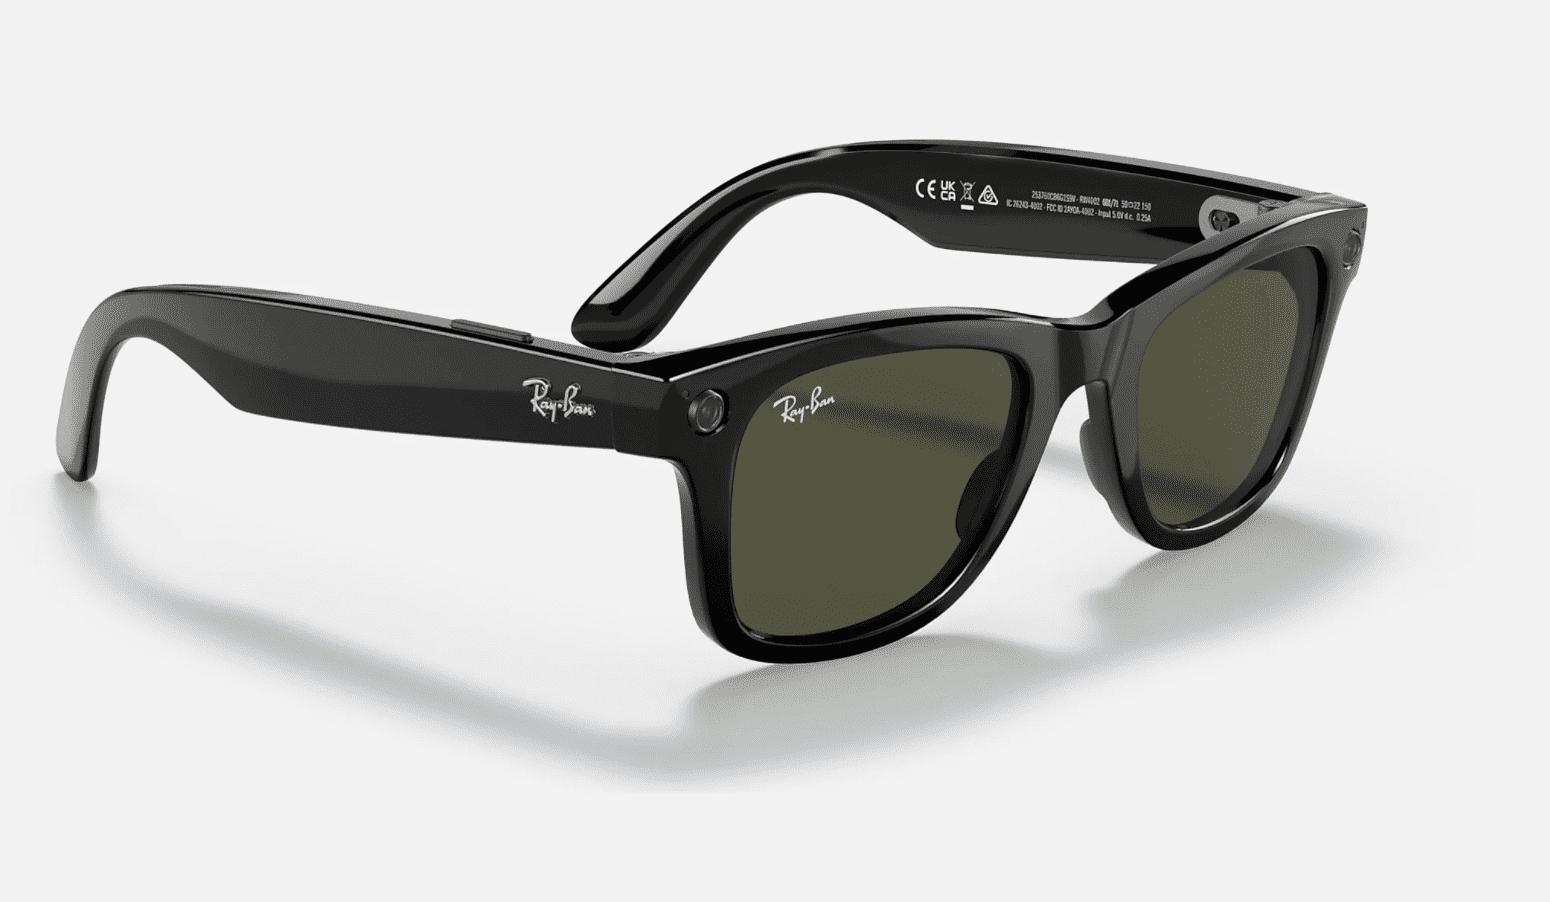 Ran-Ban smart glasses in black